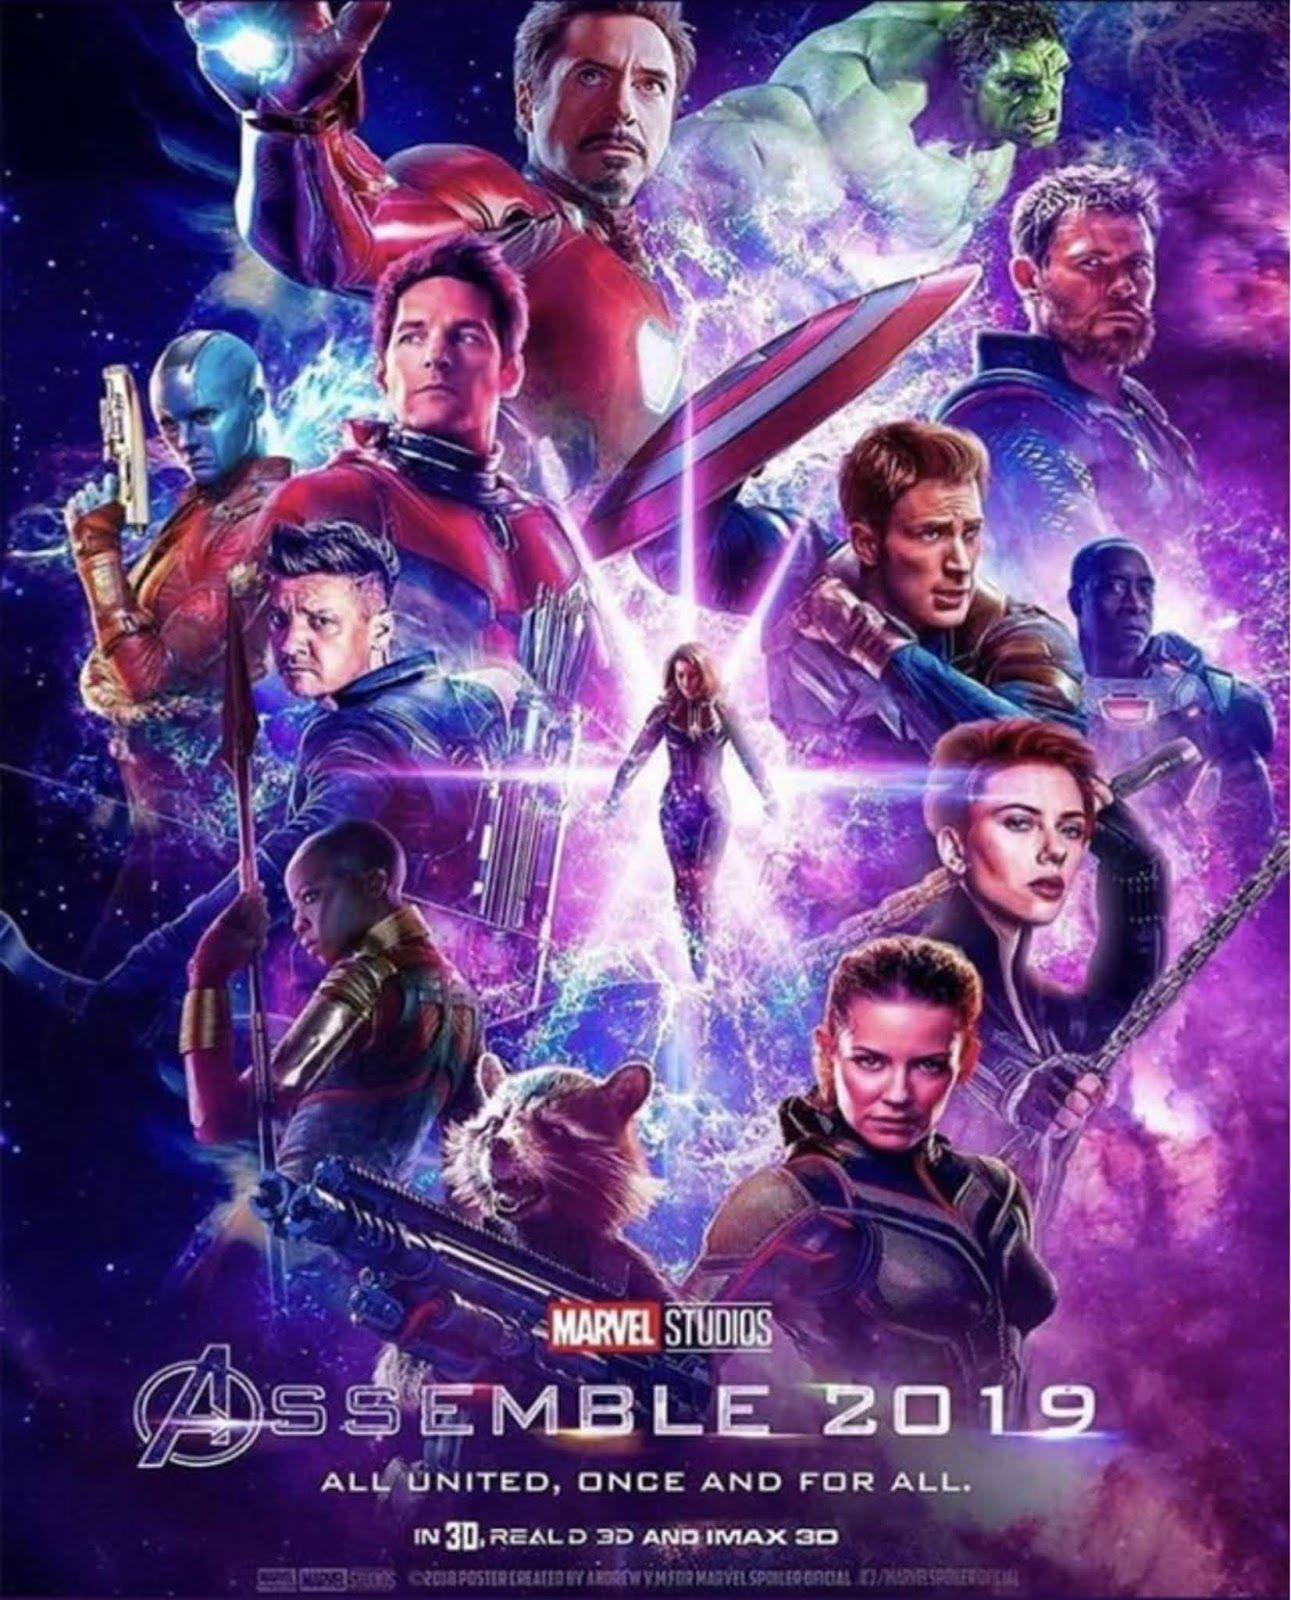 123 Mozi Bosszuallok Vegjatek Filmek 2019 Videa Online Magyar Teljes Indavideo Marvel Superheroes Avengers Marvel Avengers